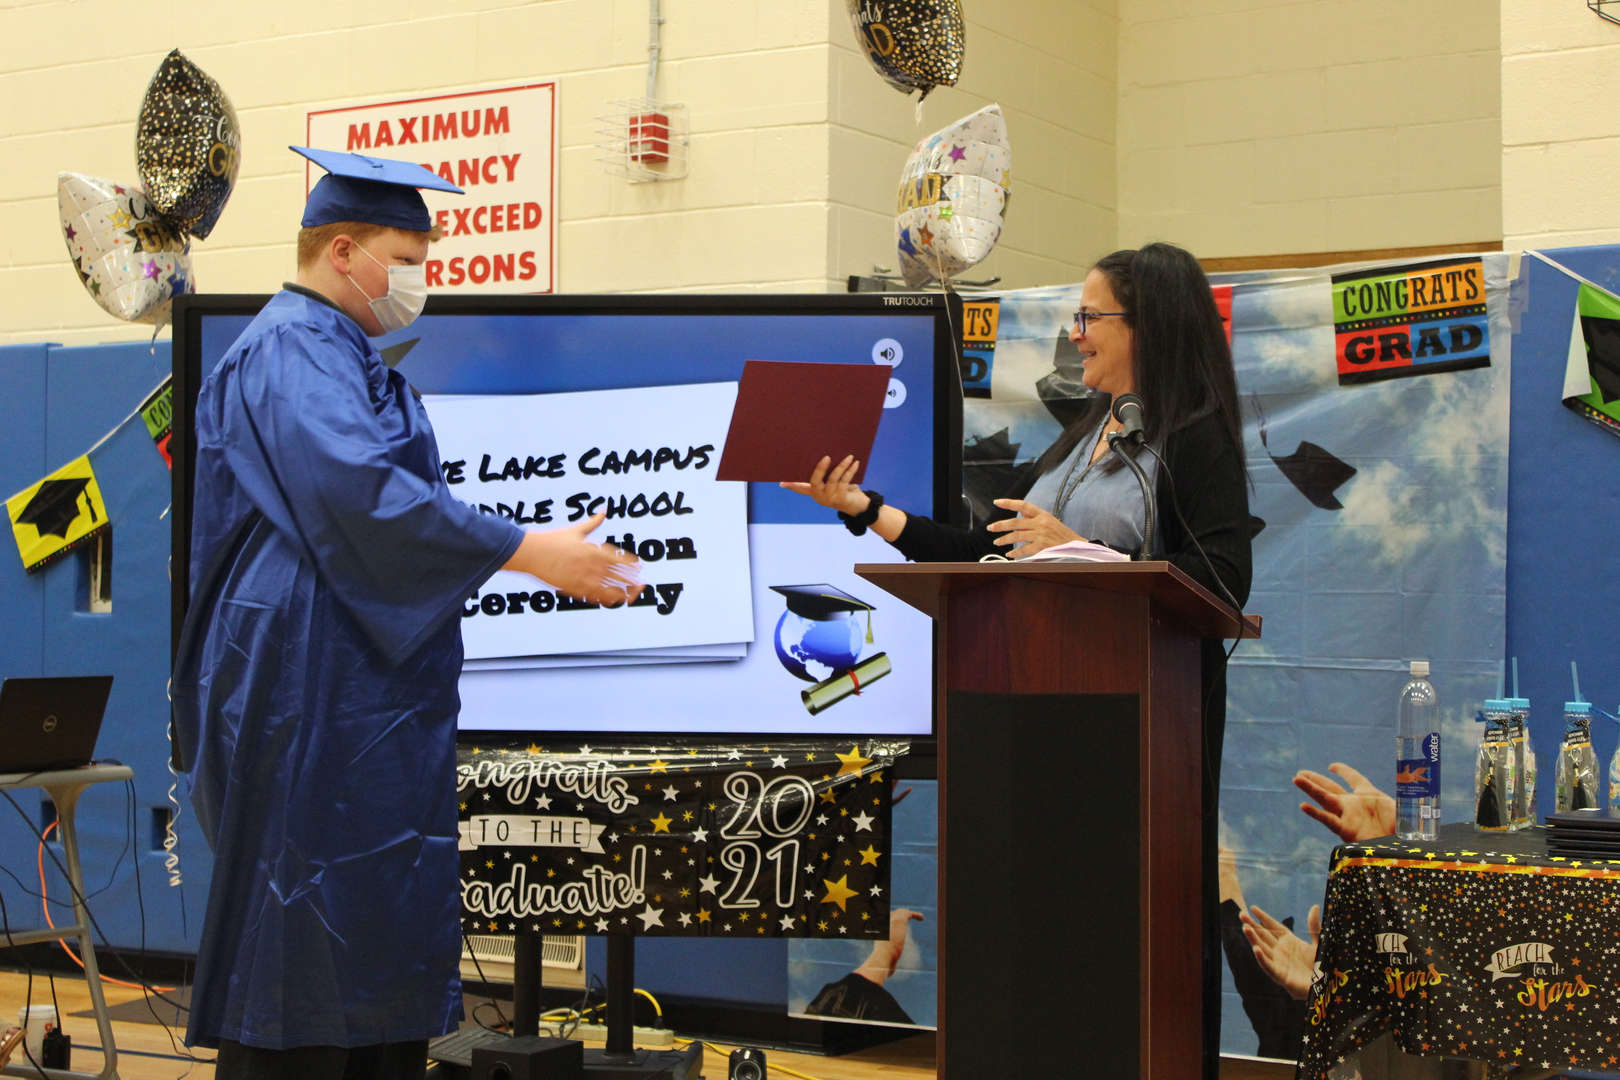 Graduate Declan Byrne accepts an award from teacher Tiziana DeMasi.